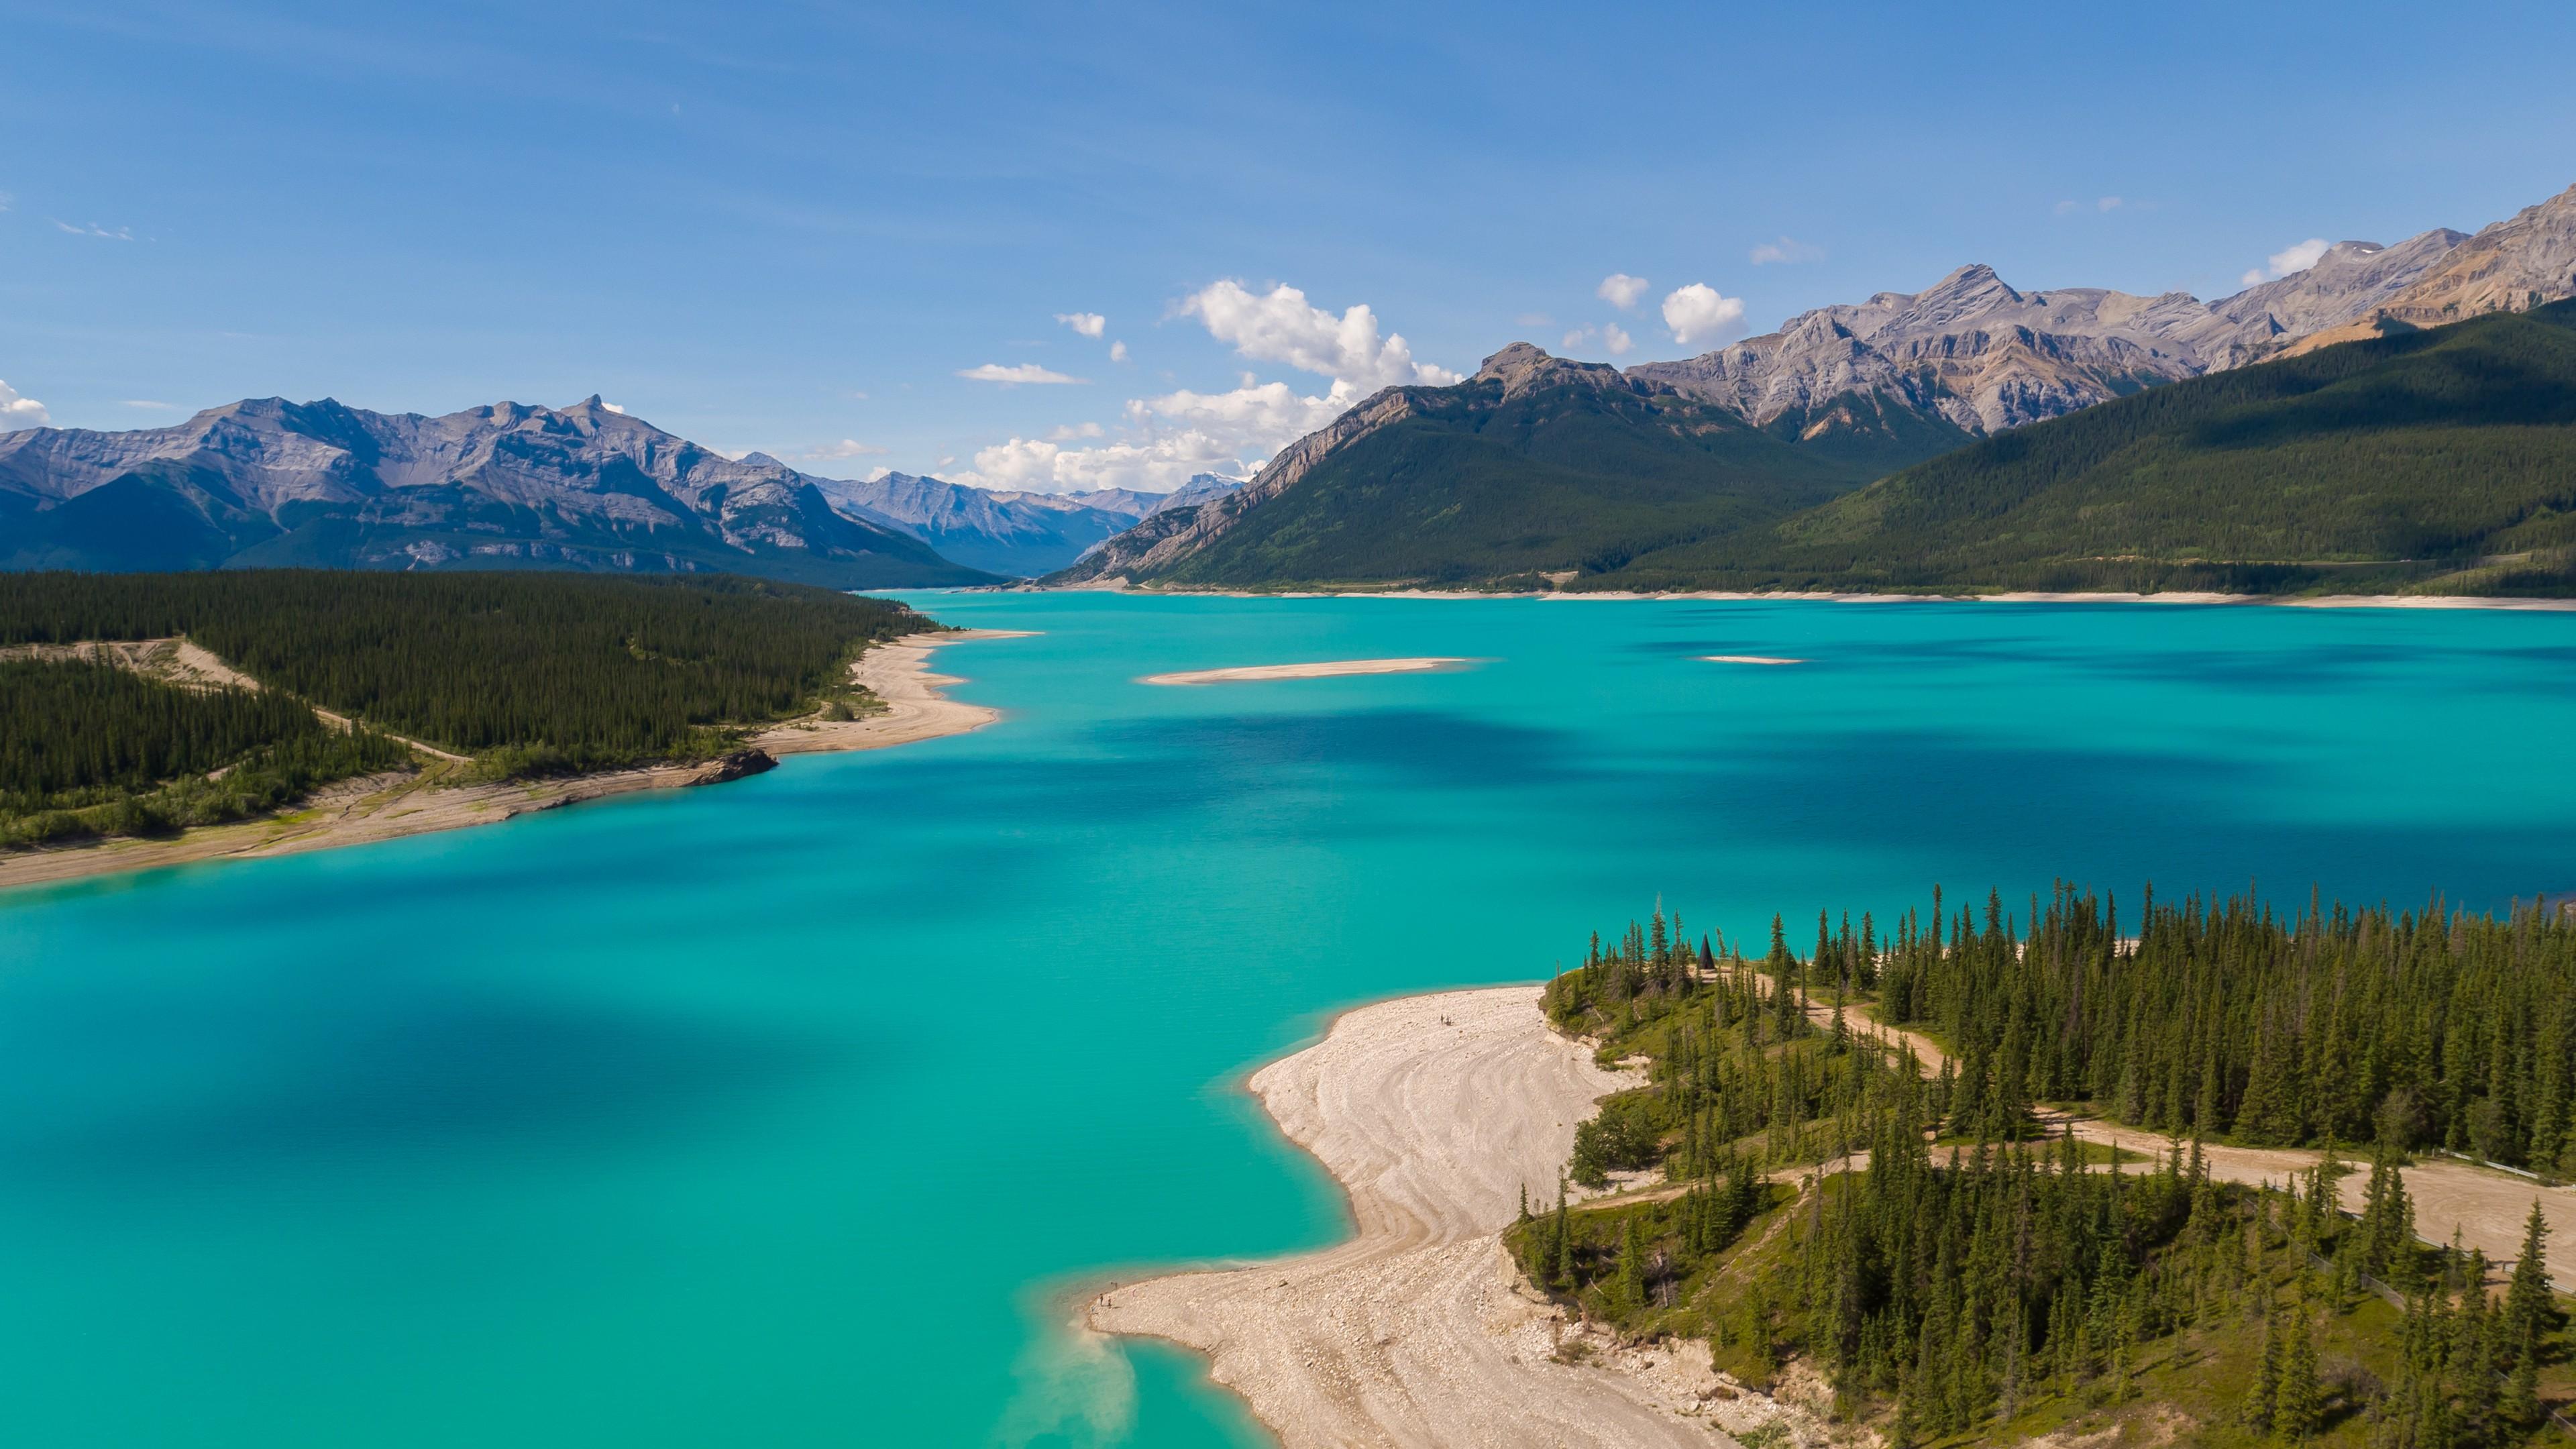 Wallpaper Abraham Lake Canada mountain nature 4k Nature 15452 3840x2160